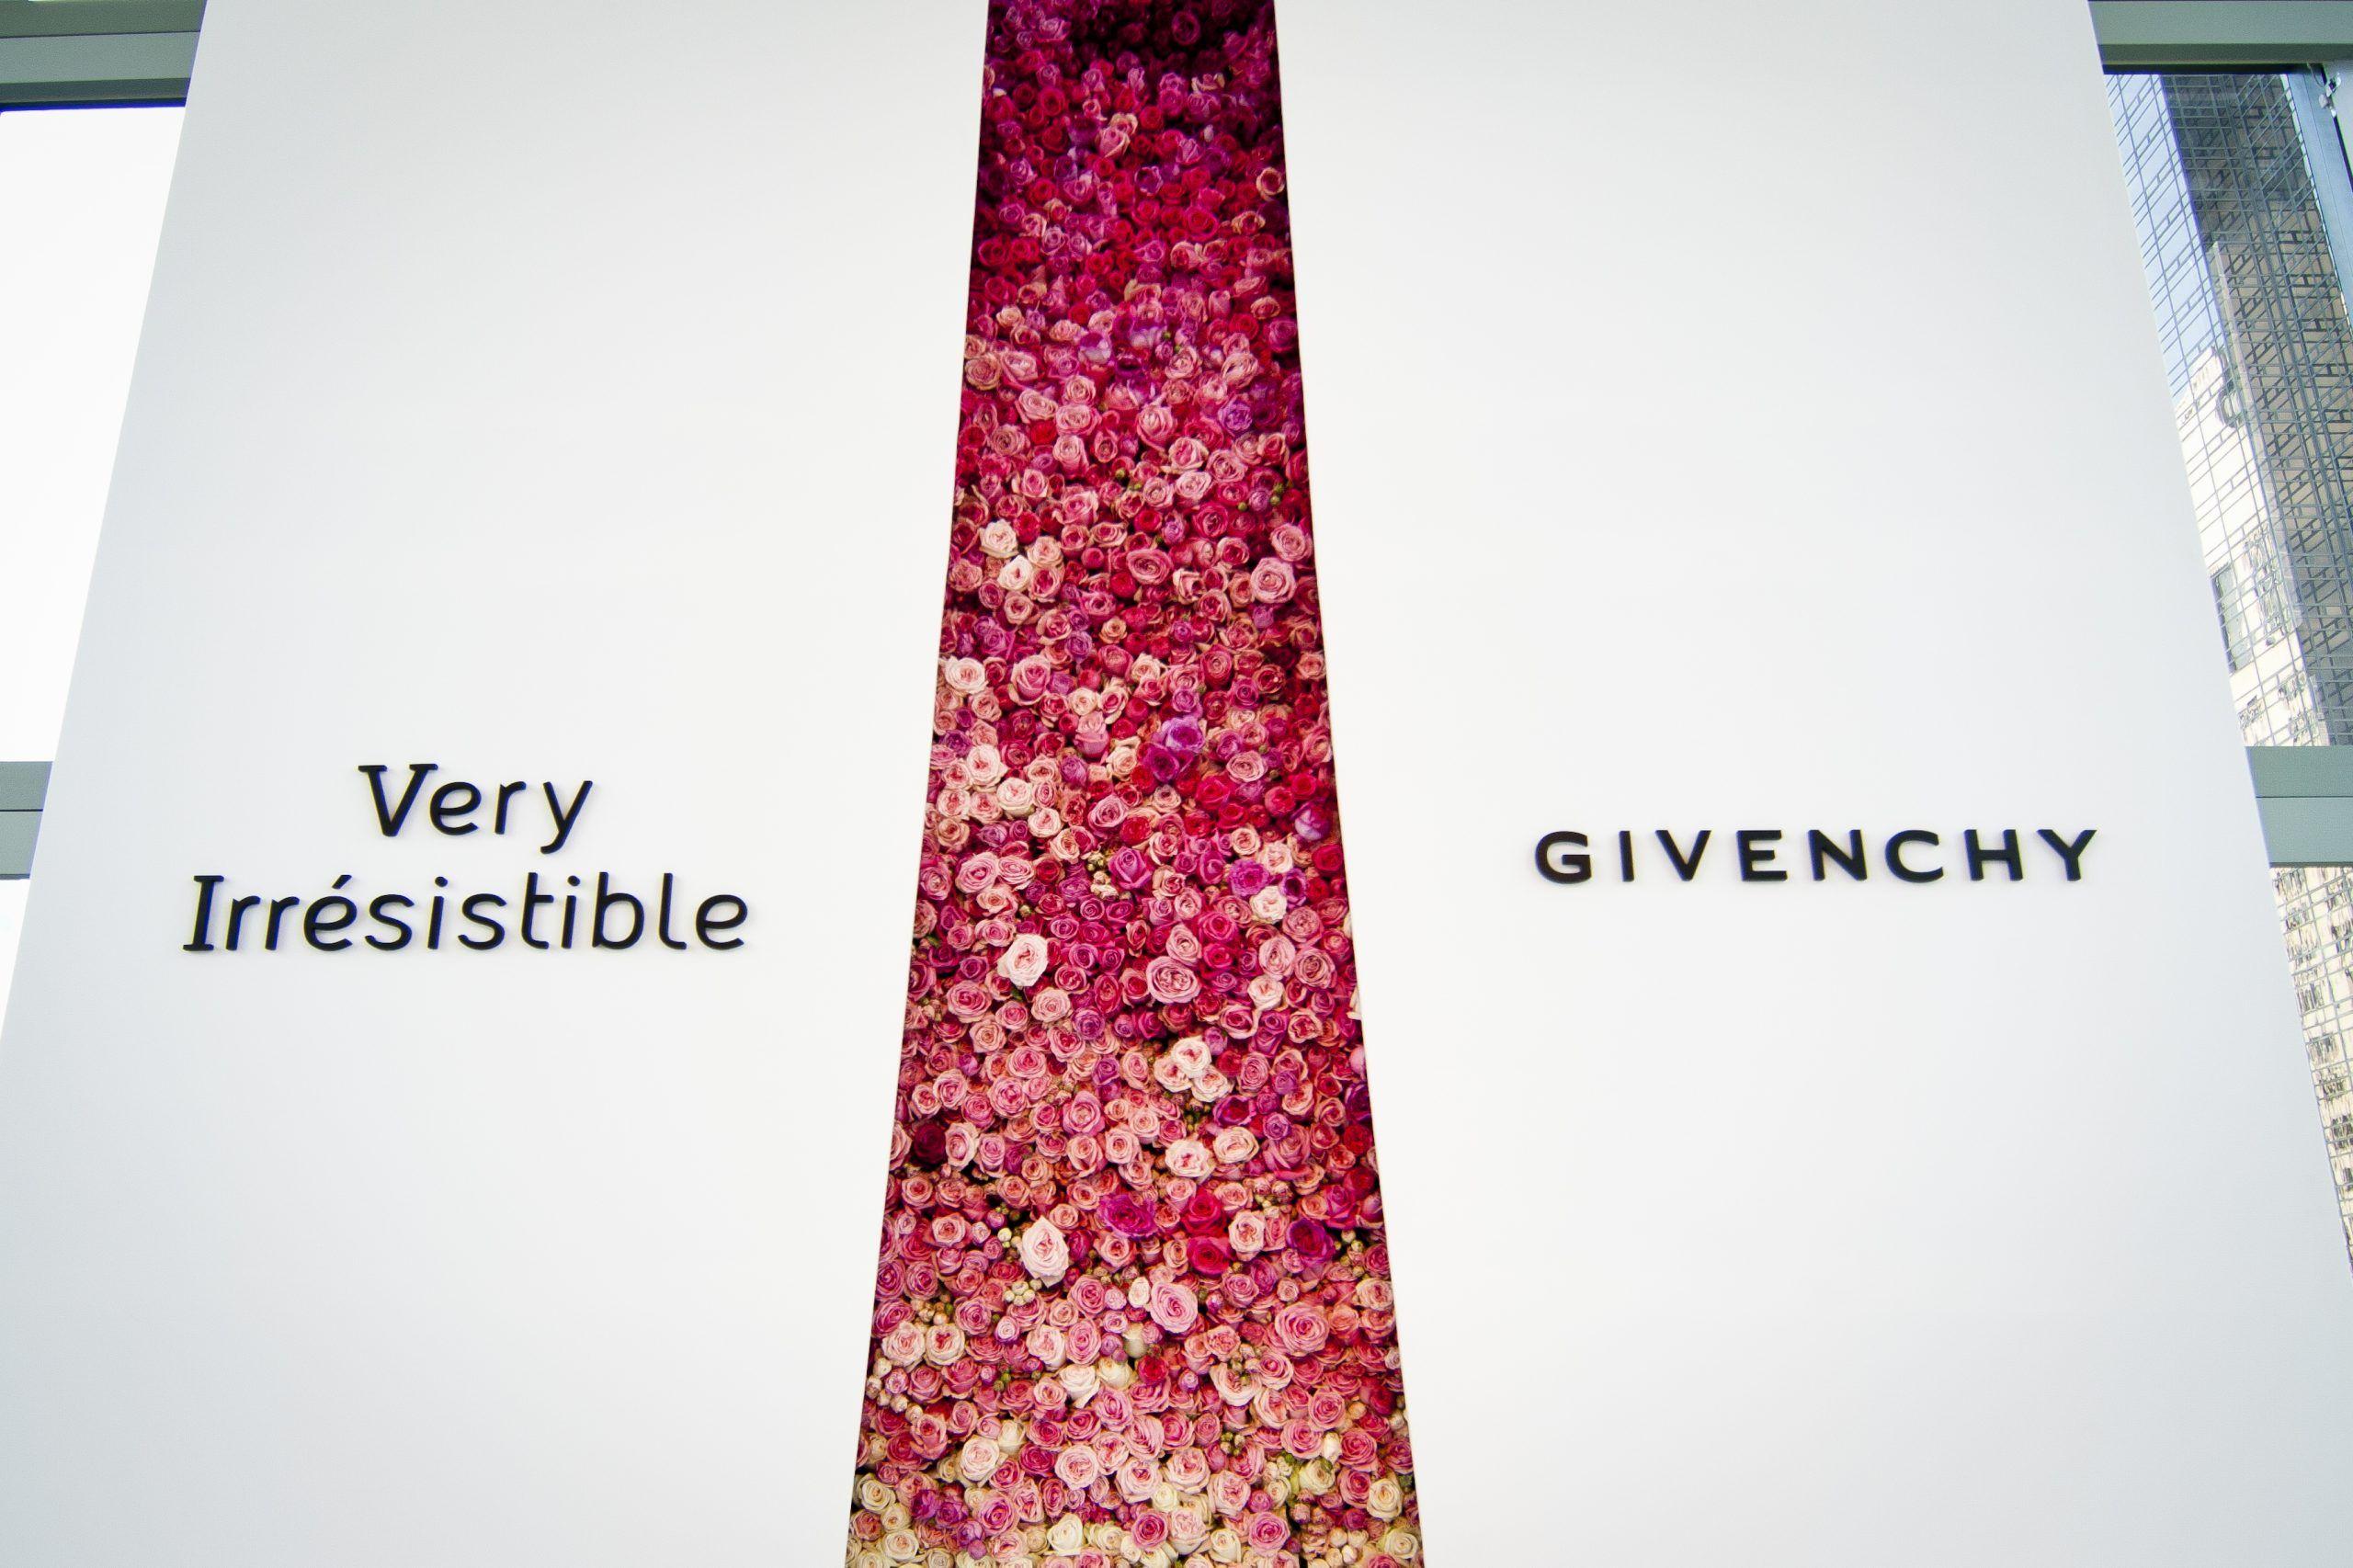 Case Study: Givenchy